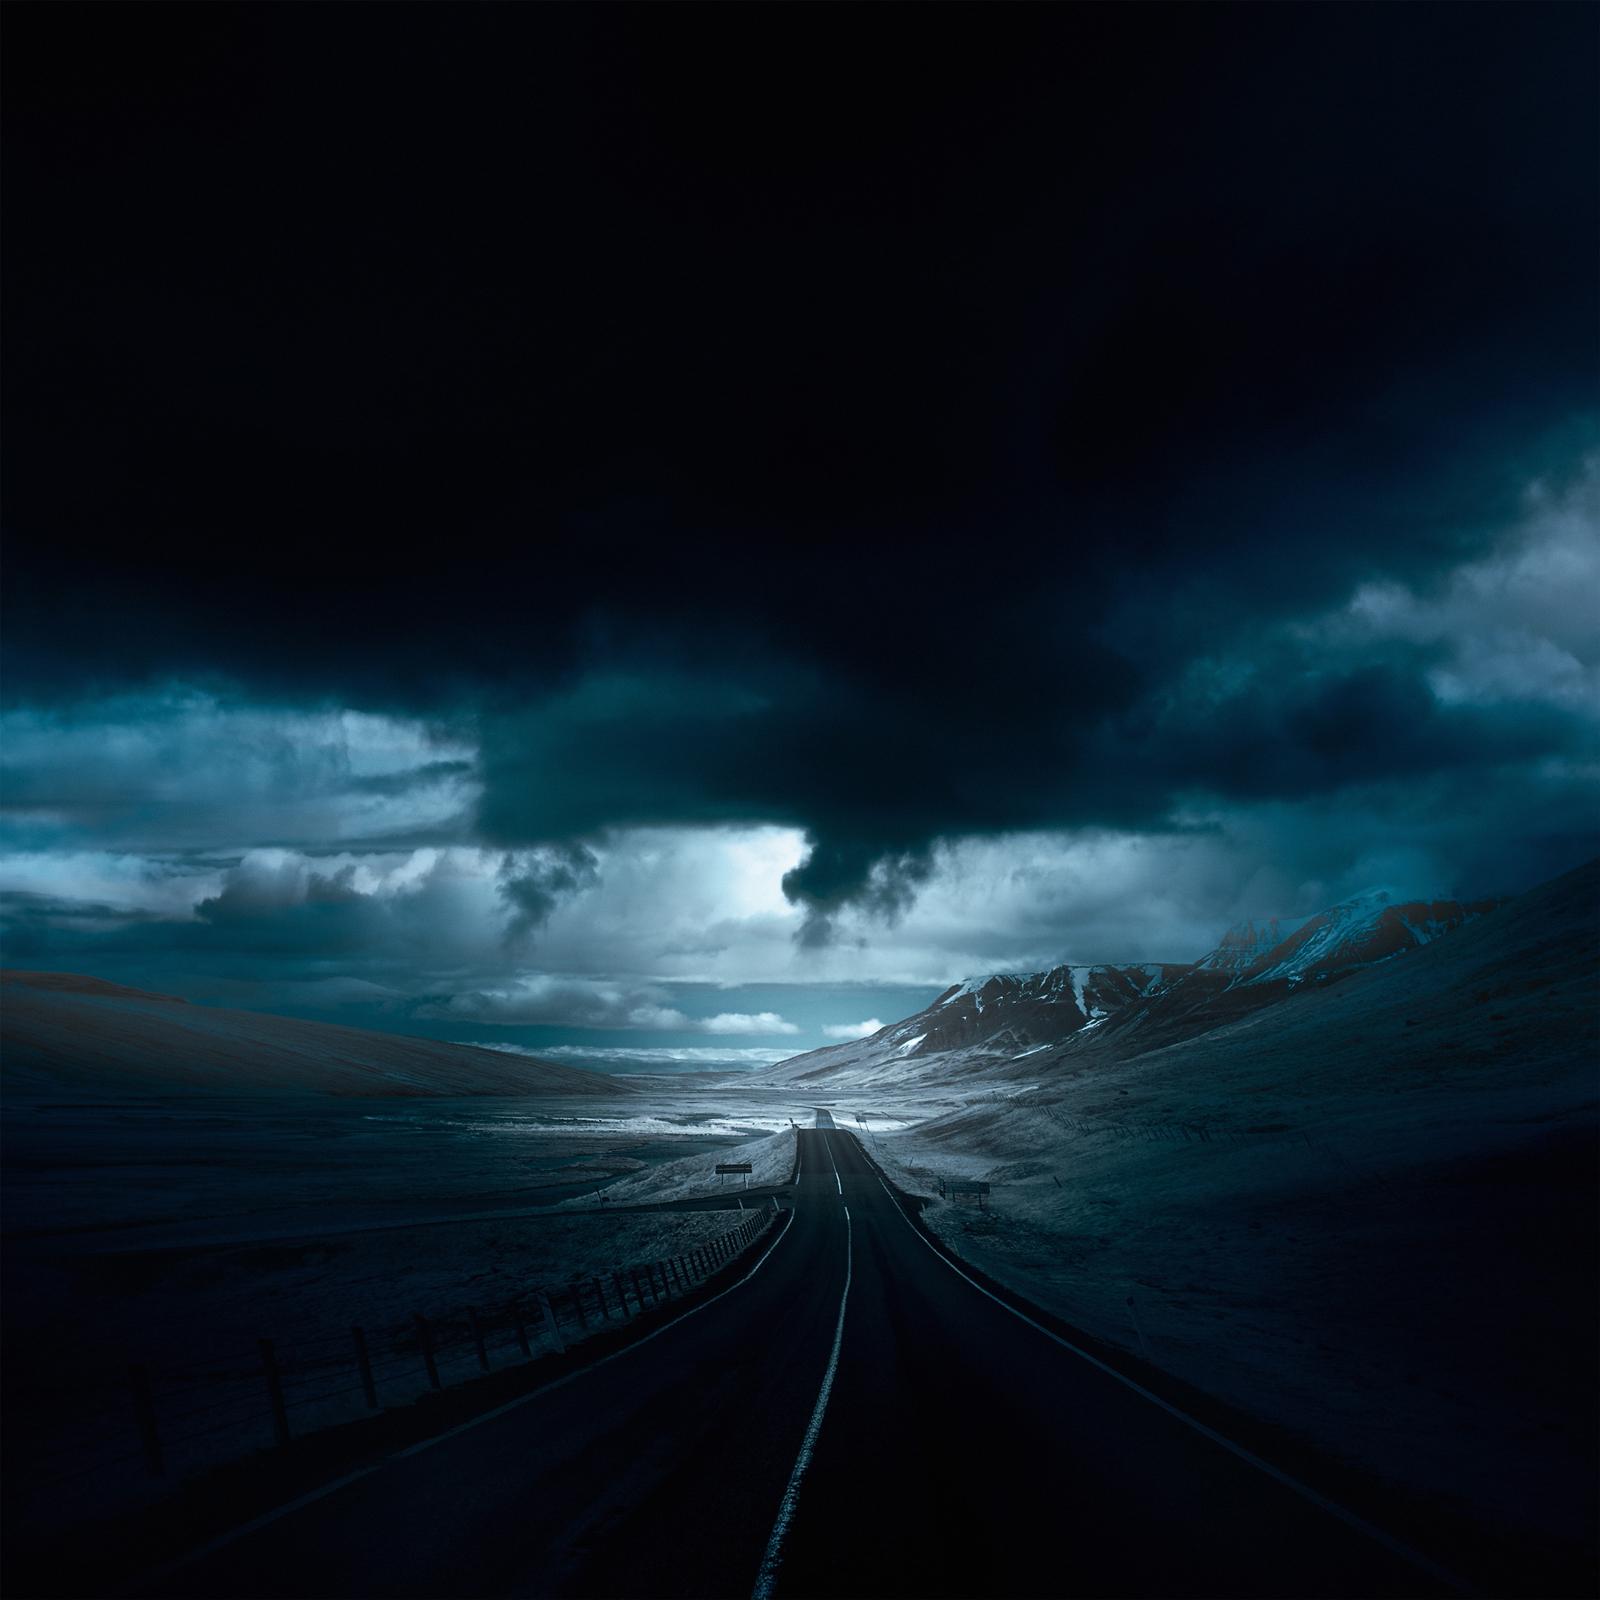 Roads_IntotheBlue_AndyLee©2015.JPG